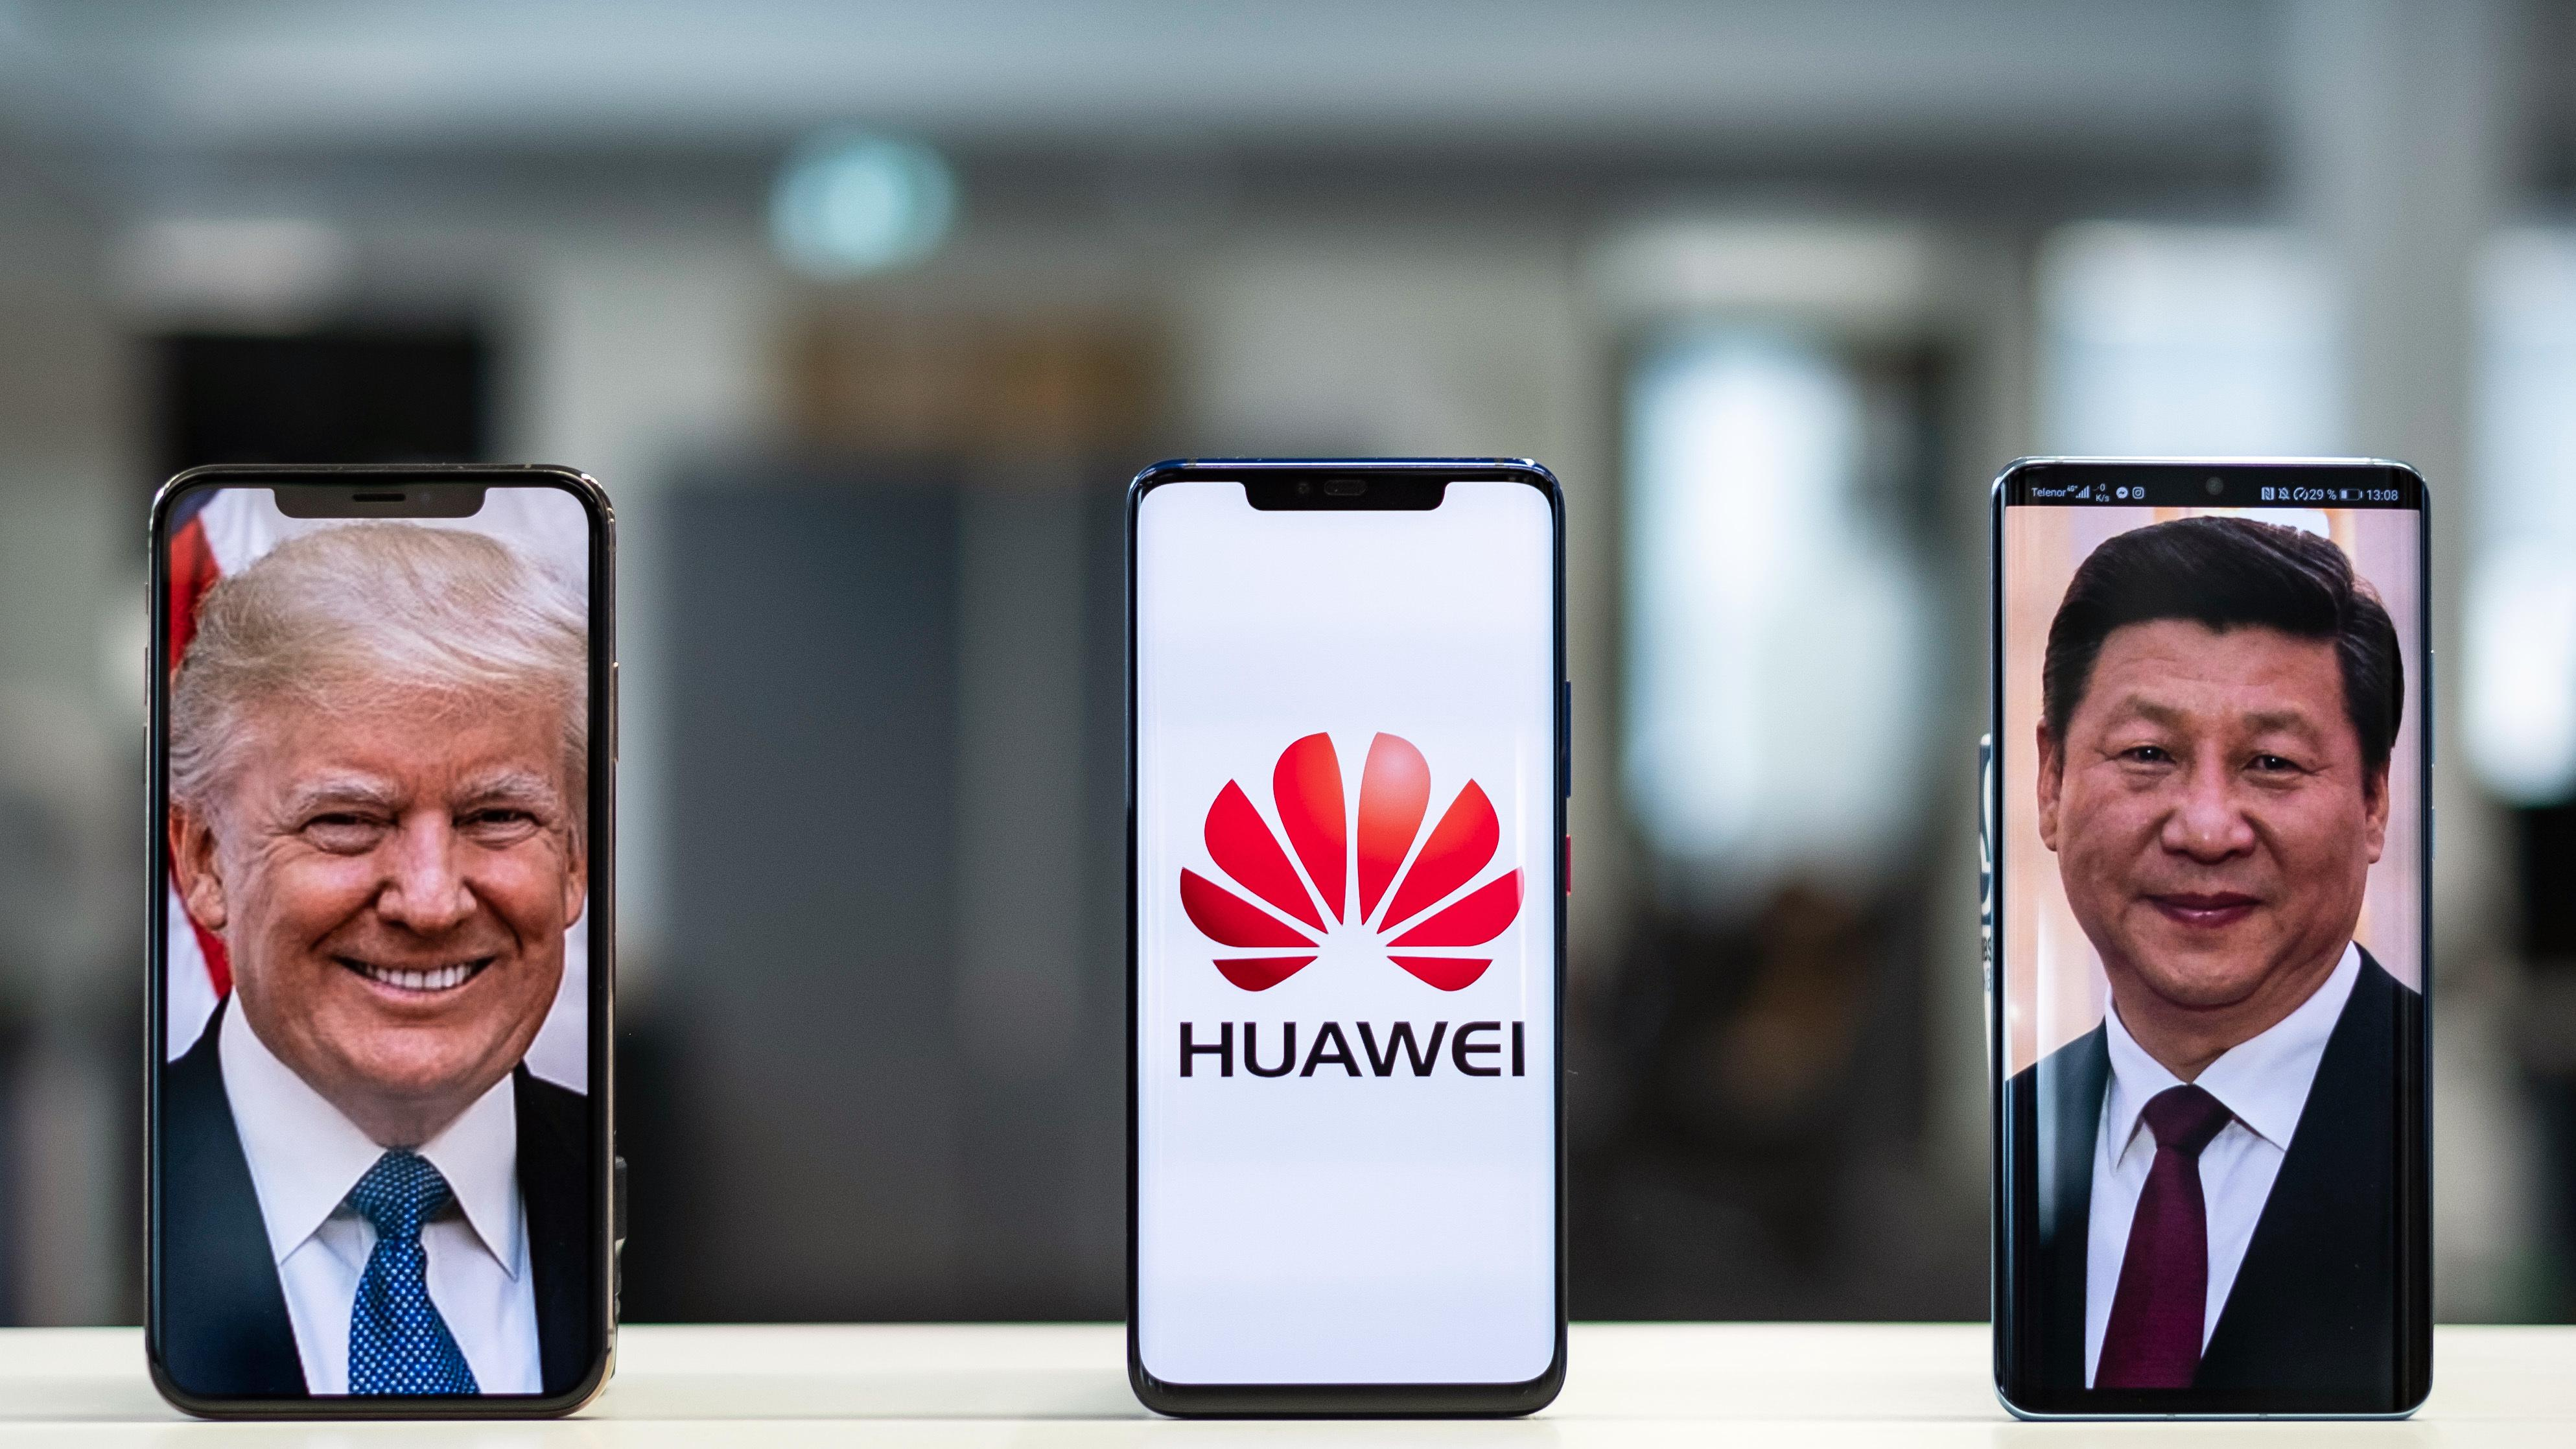 Huawei-krisen forklart